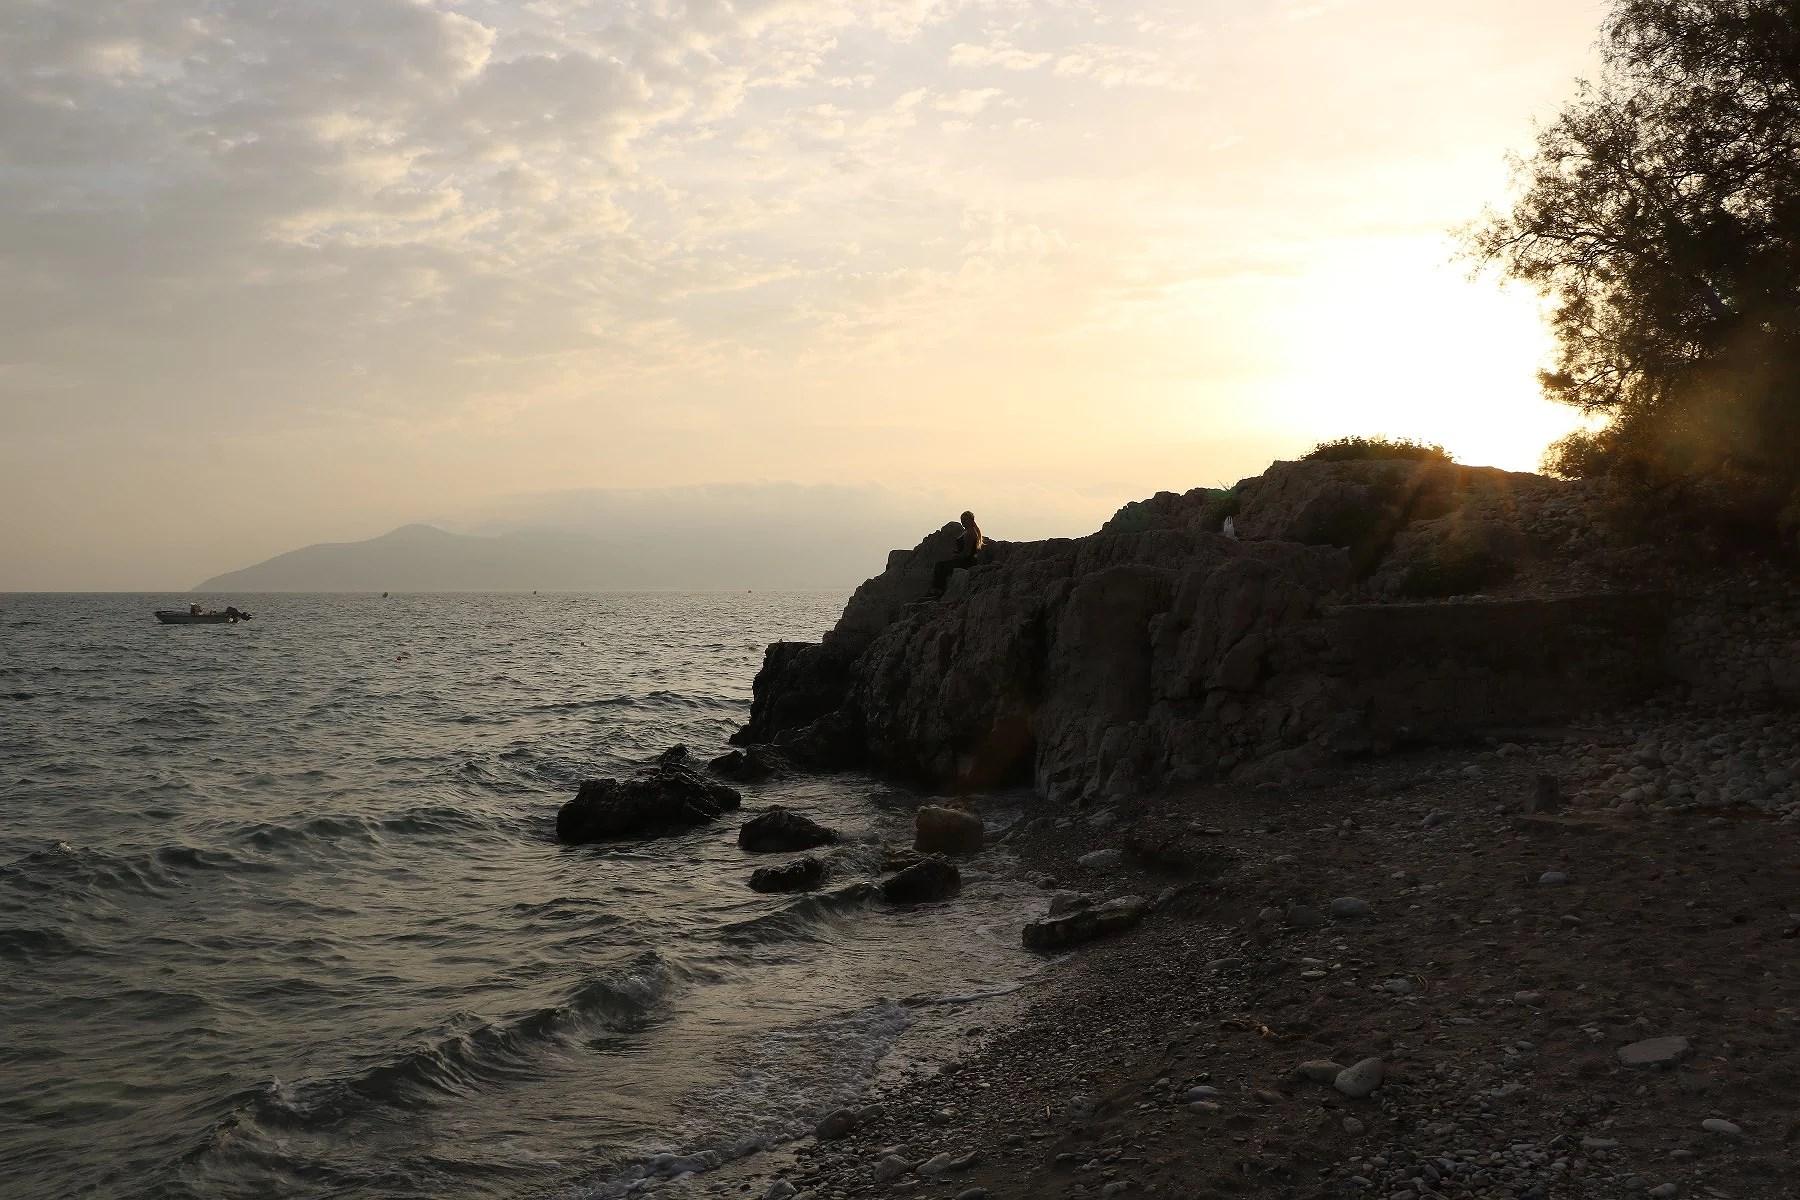 Phythagorion beach by sunset.